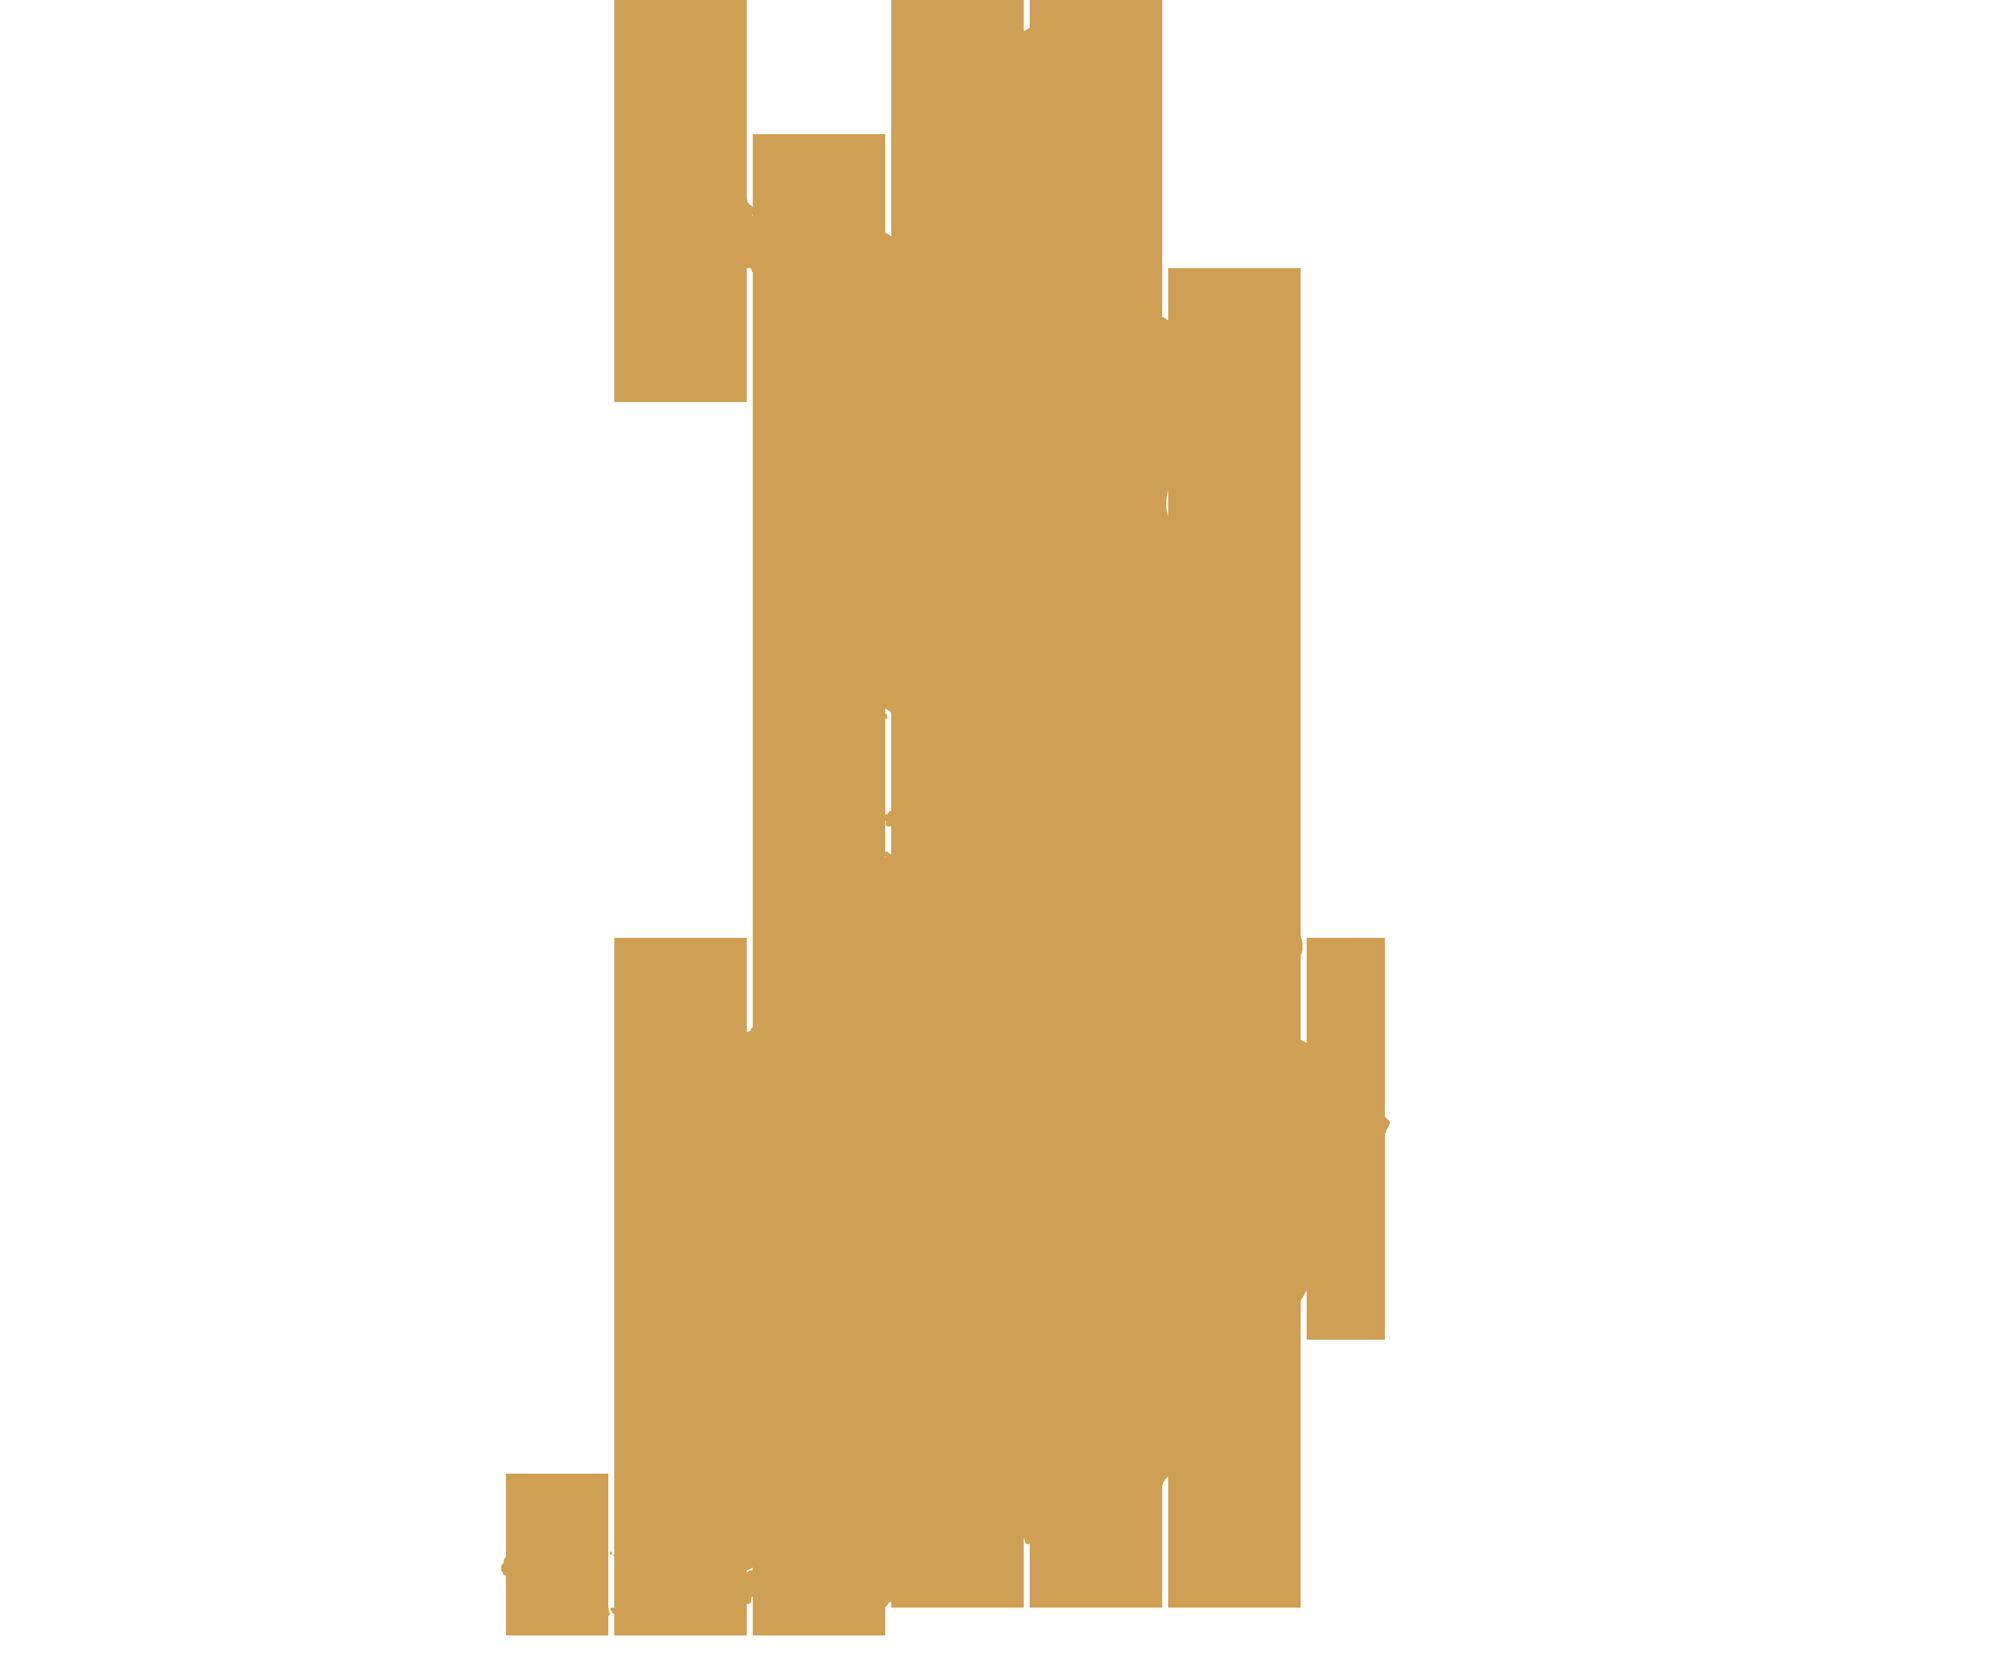 DMC Finland map